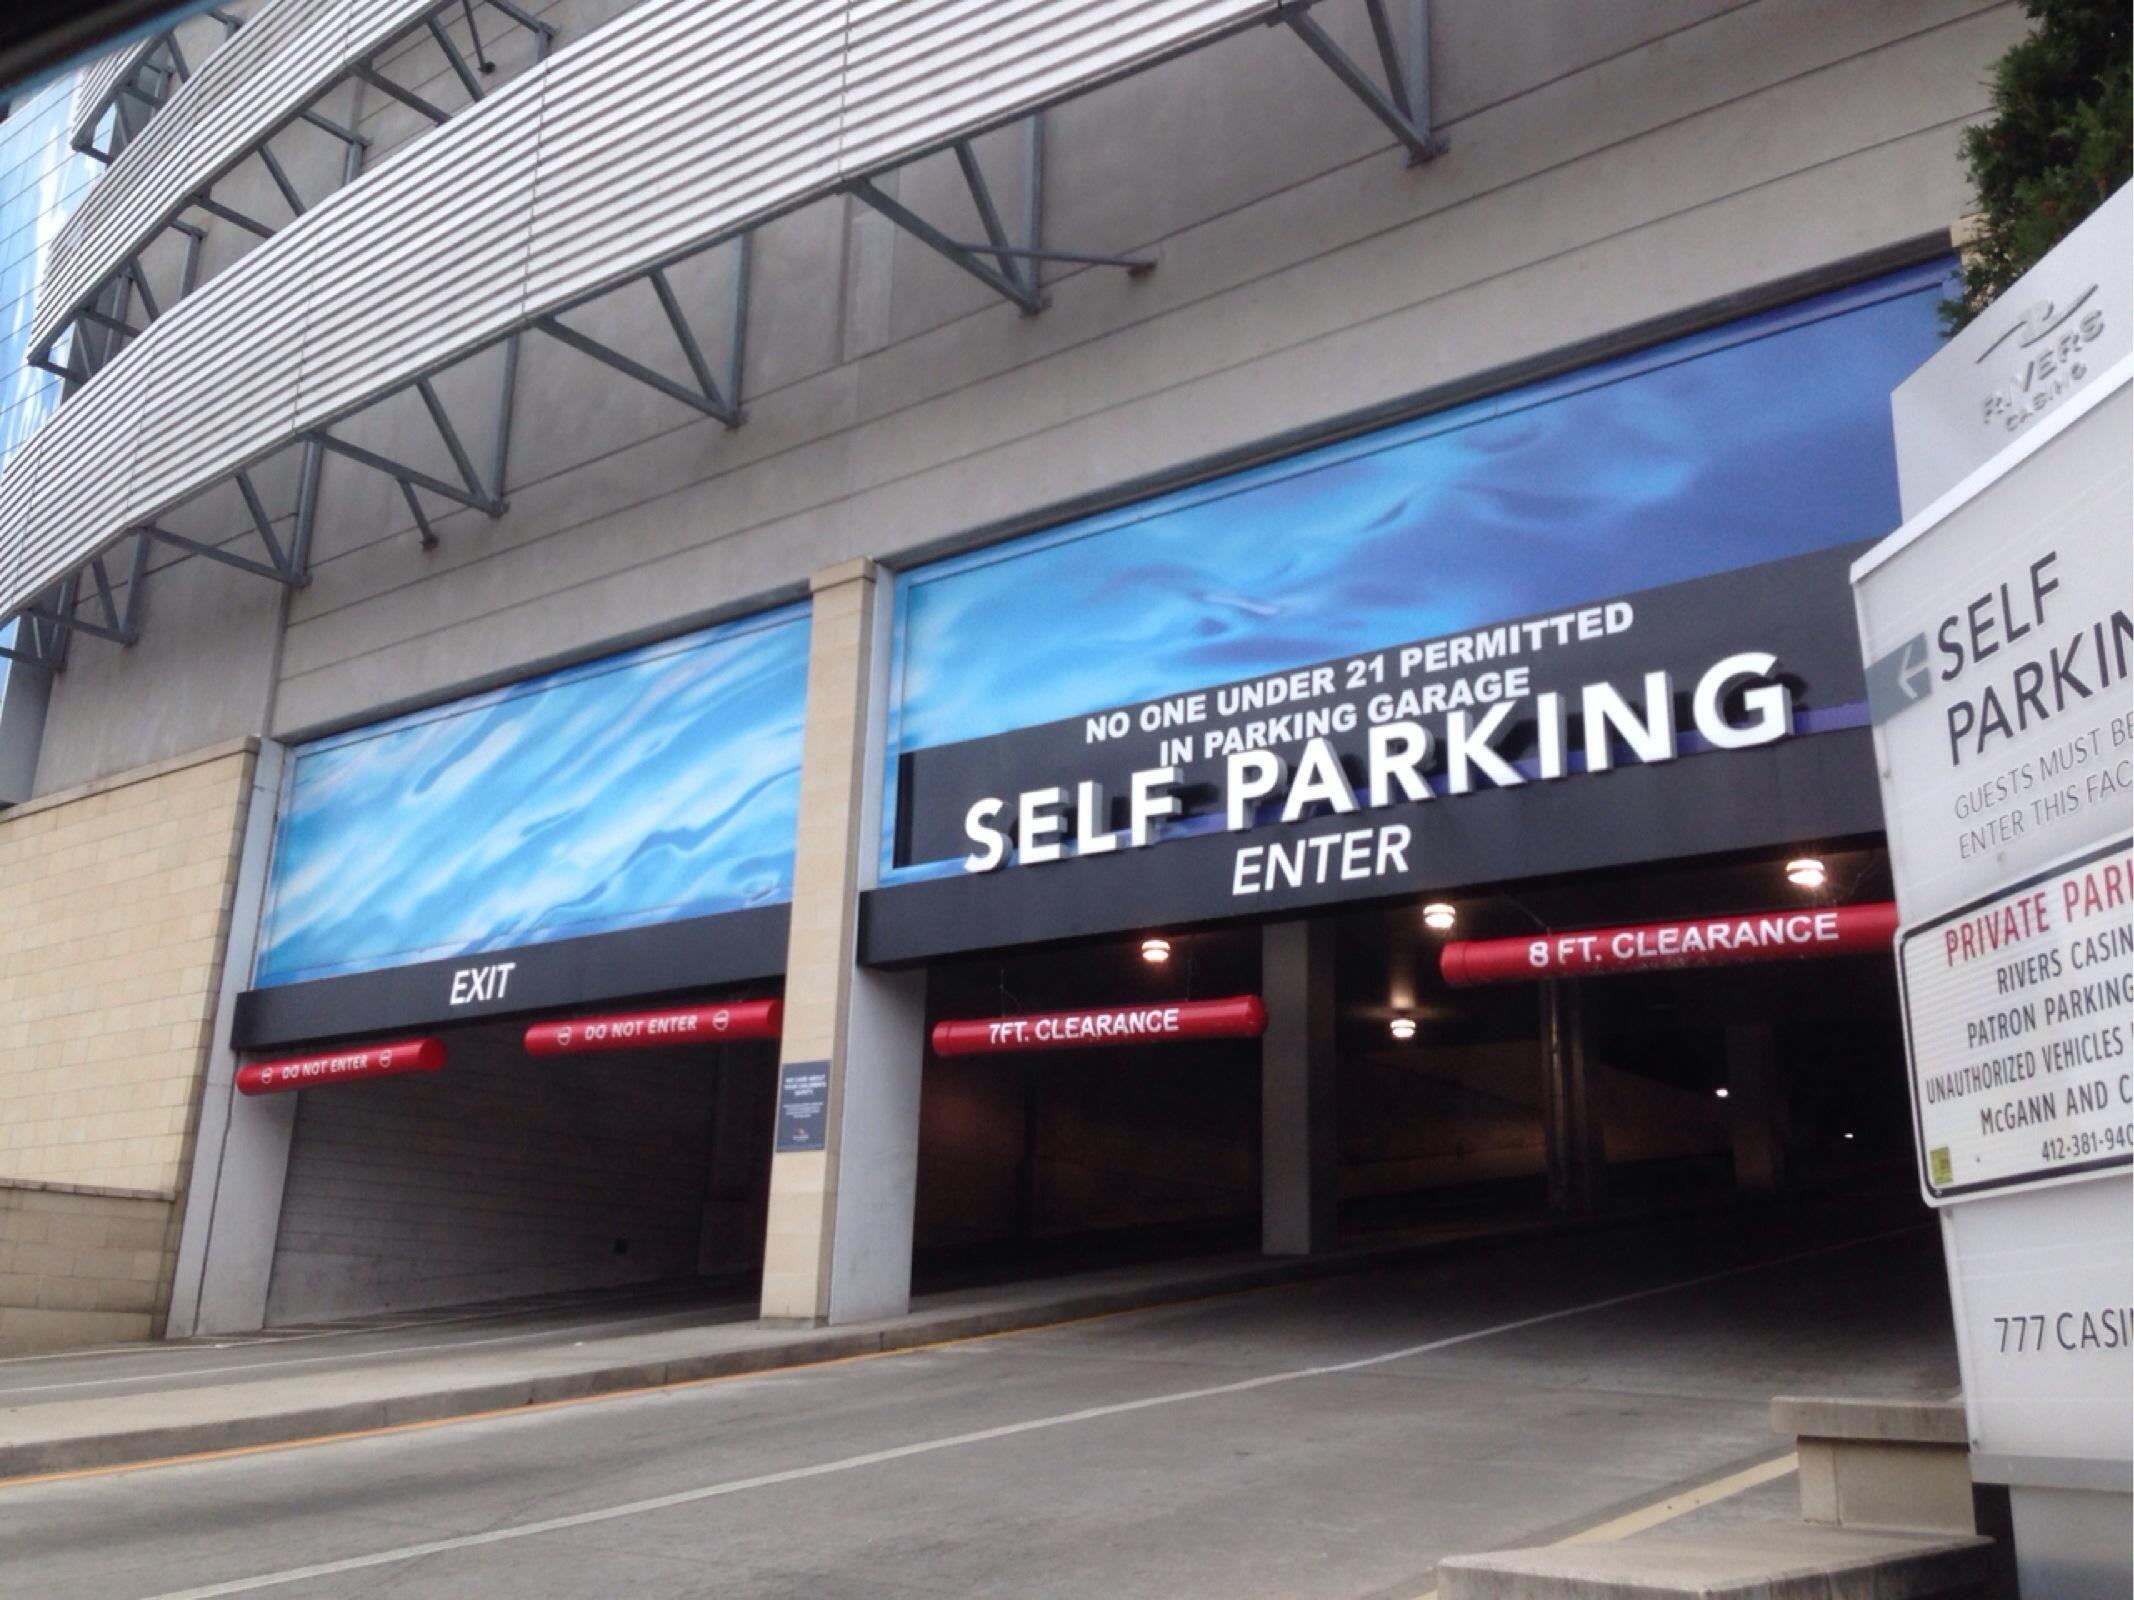 Rivers casino pittsburgh parking